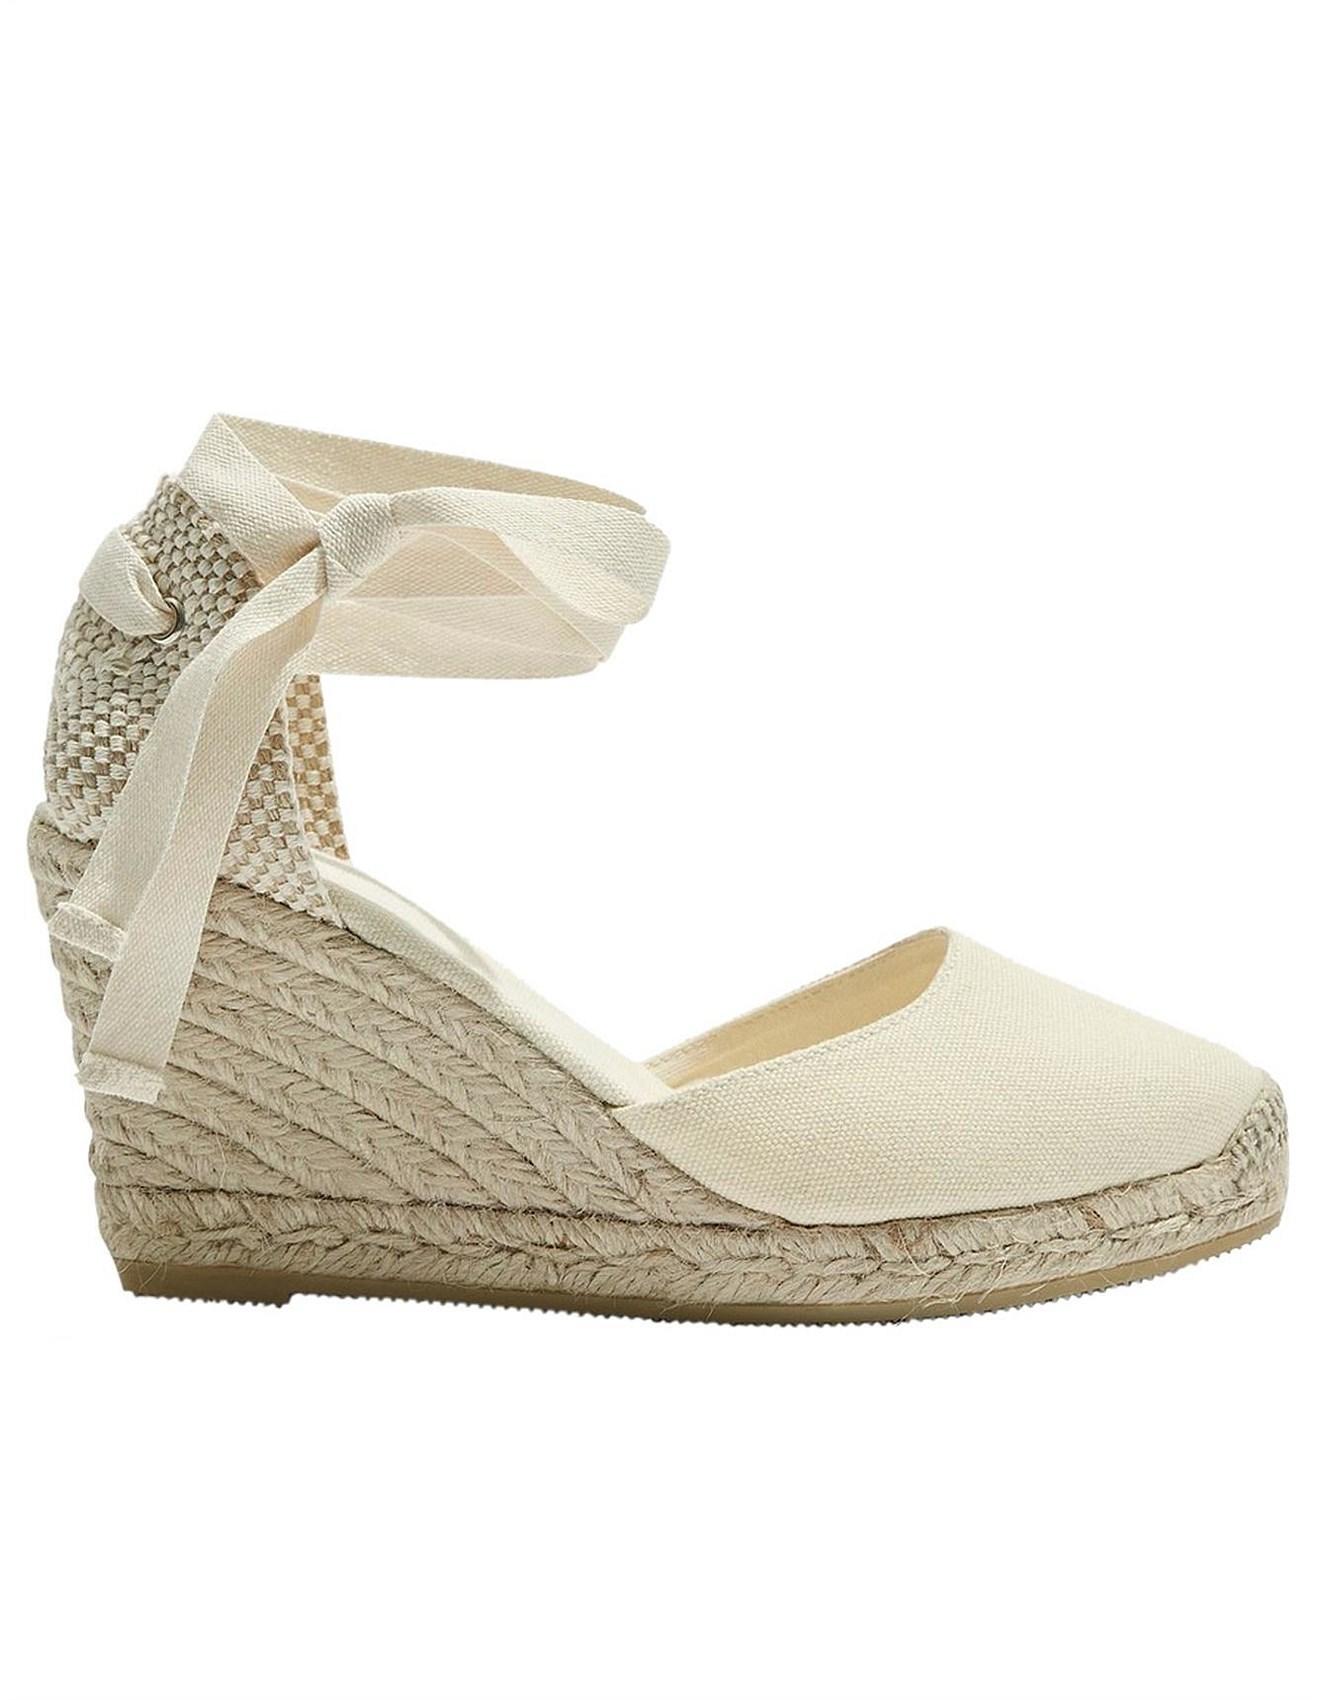 Shoes - Porto Wedge Espadrille